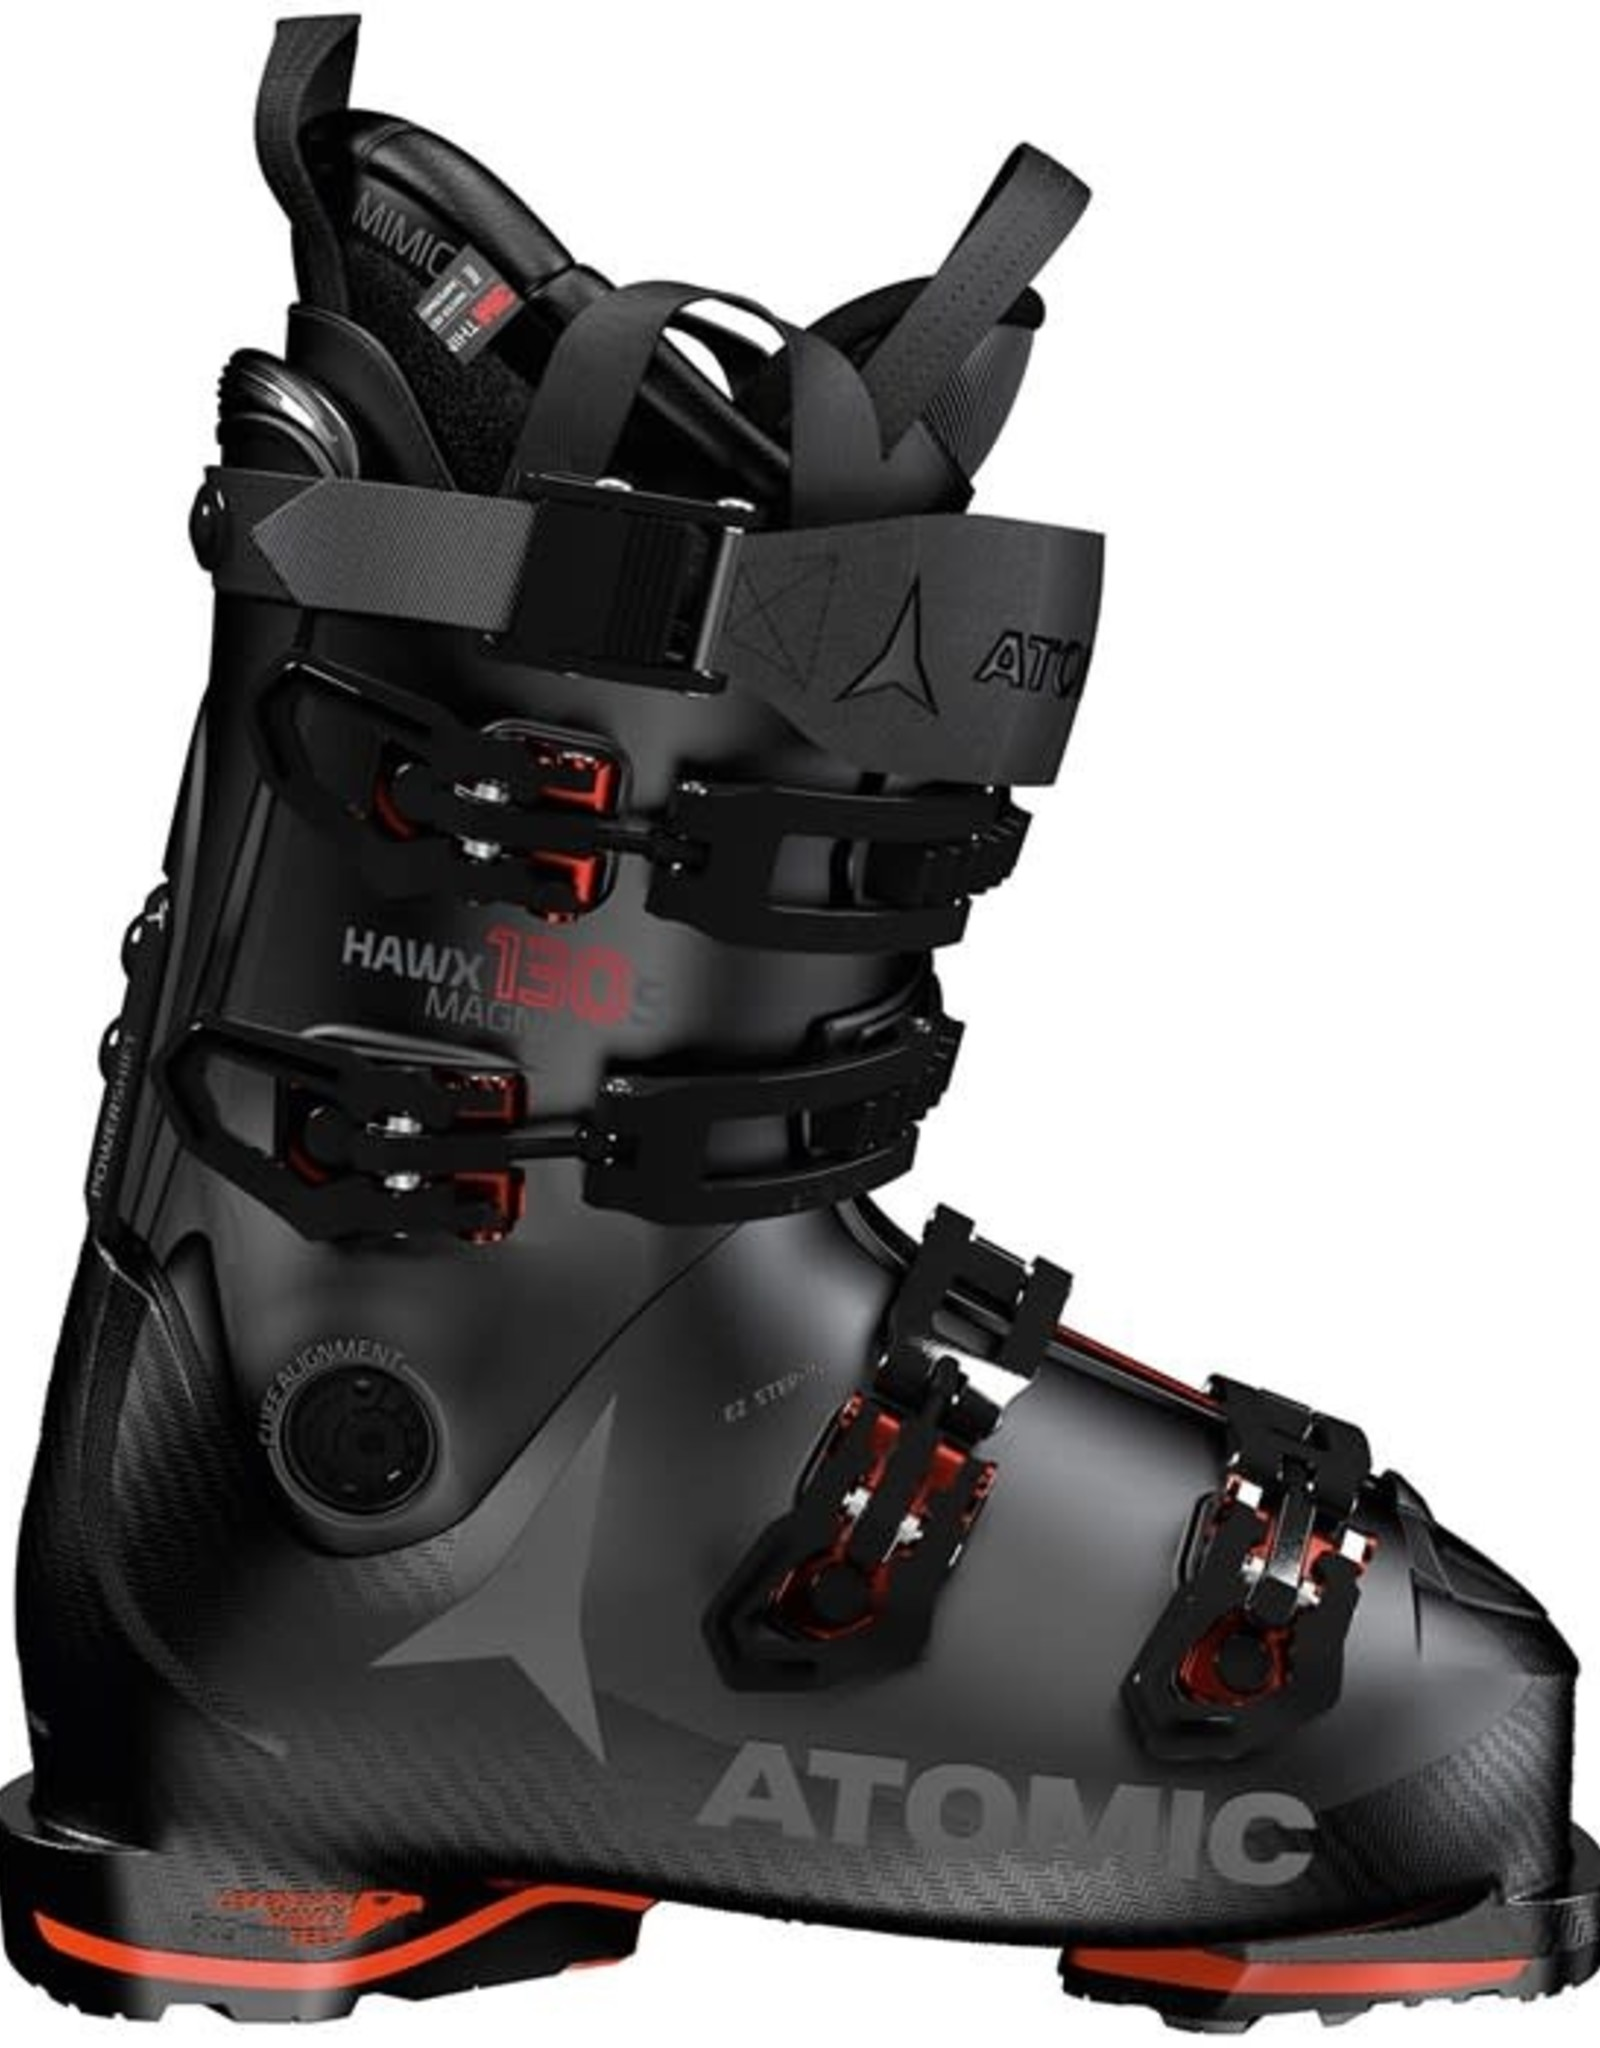 ATOMIC ATOMIC Ski Boots HAWX MAGNA 130 S GW (21/22)